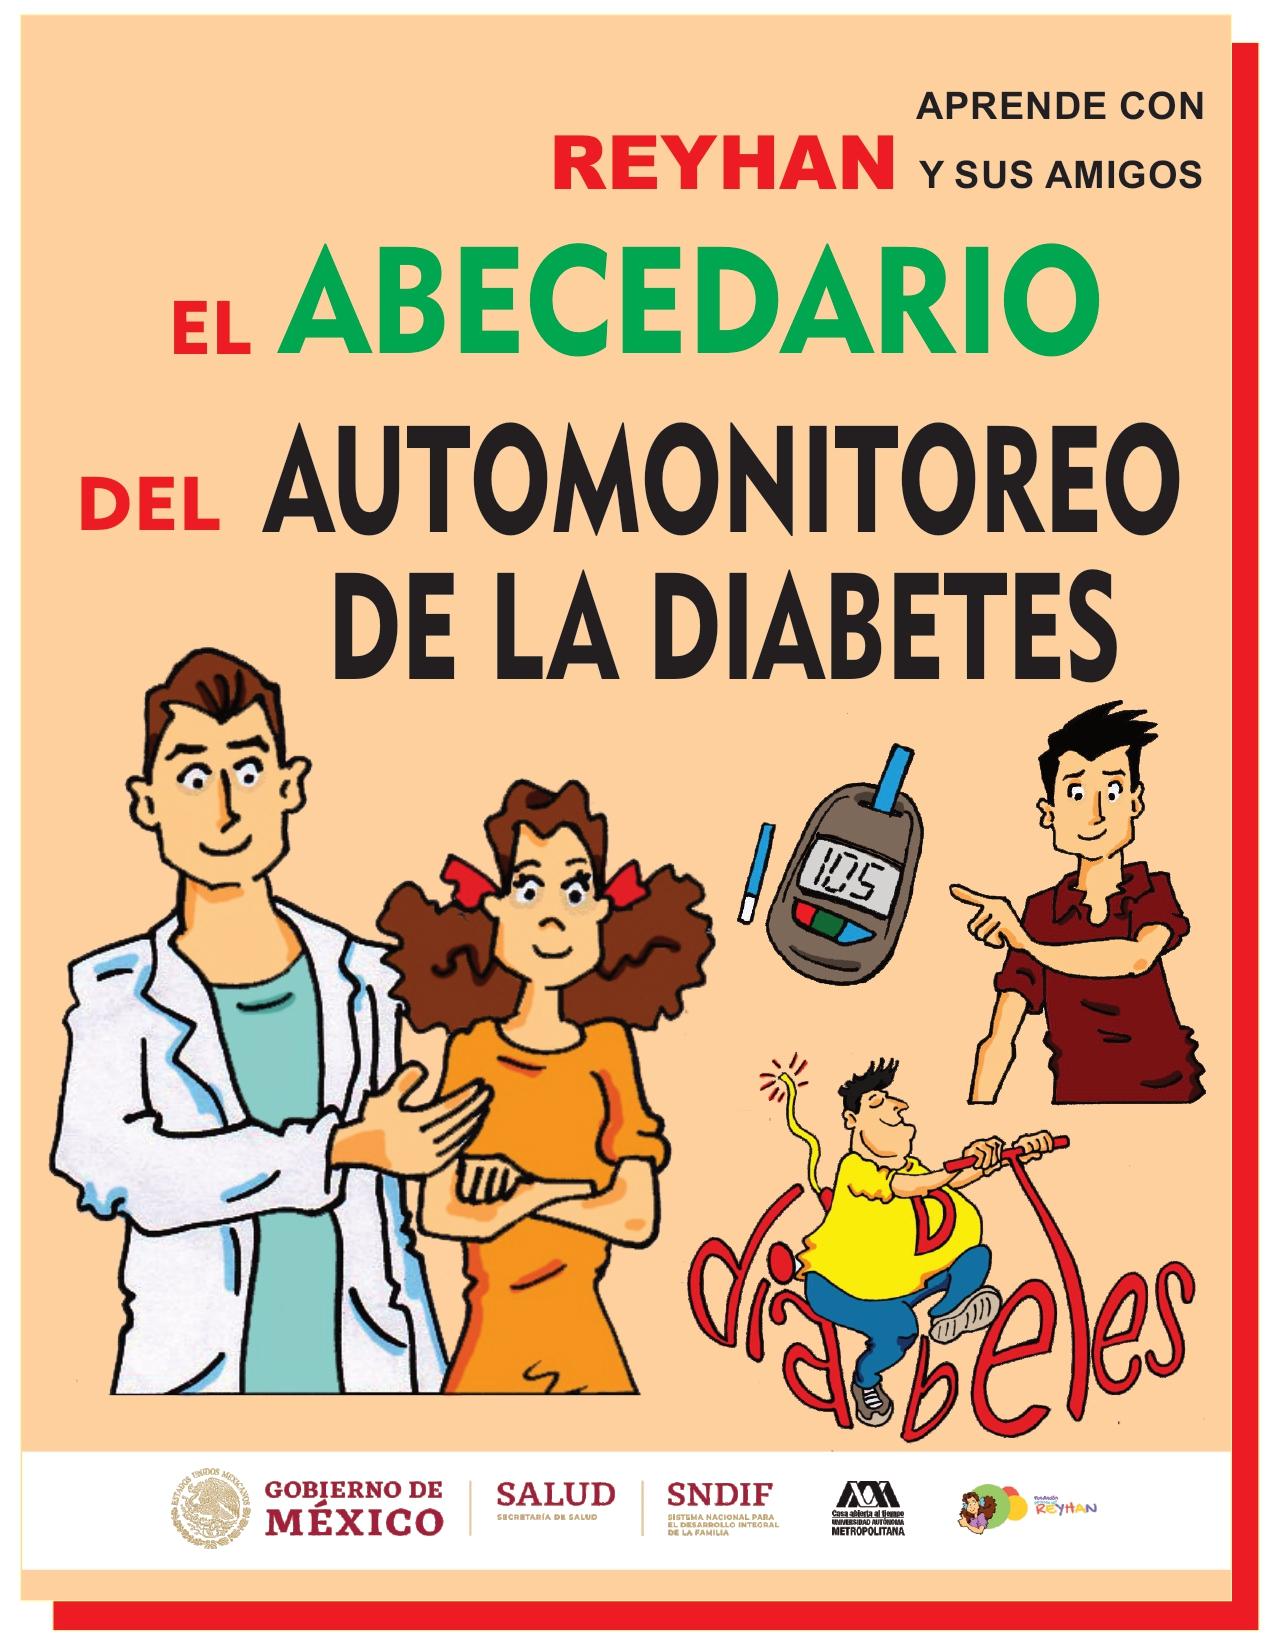 ABC automonitoreo diabetes_pages-to-jpg-0001